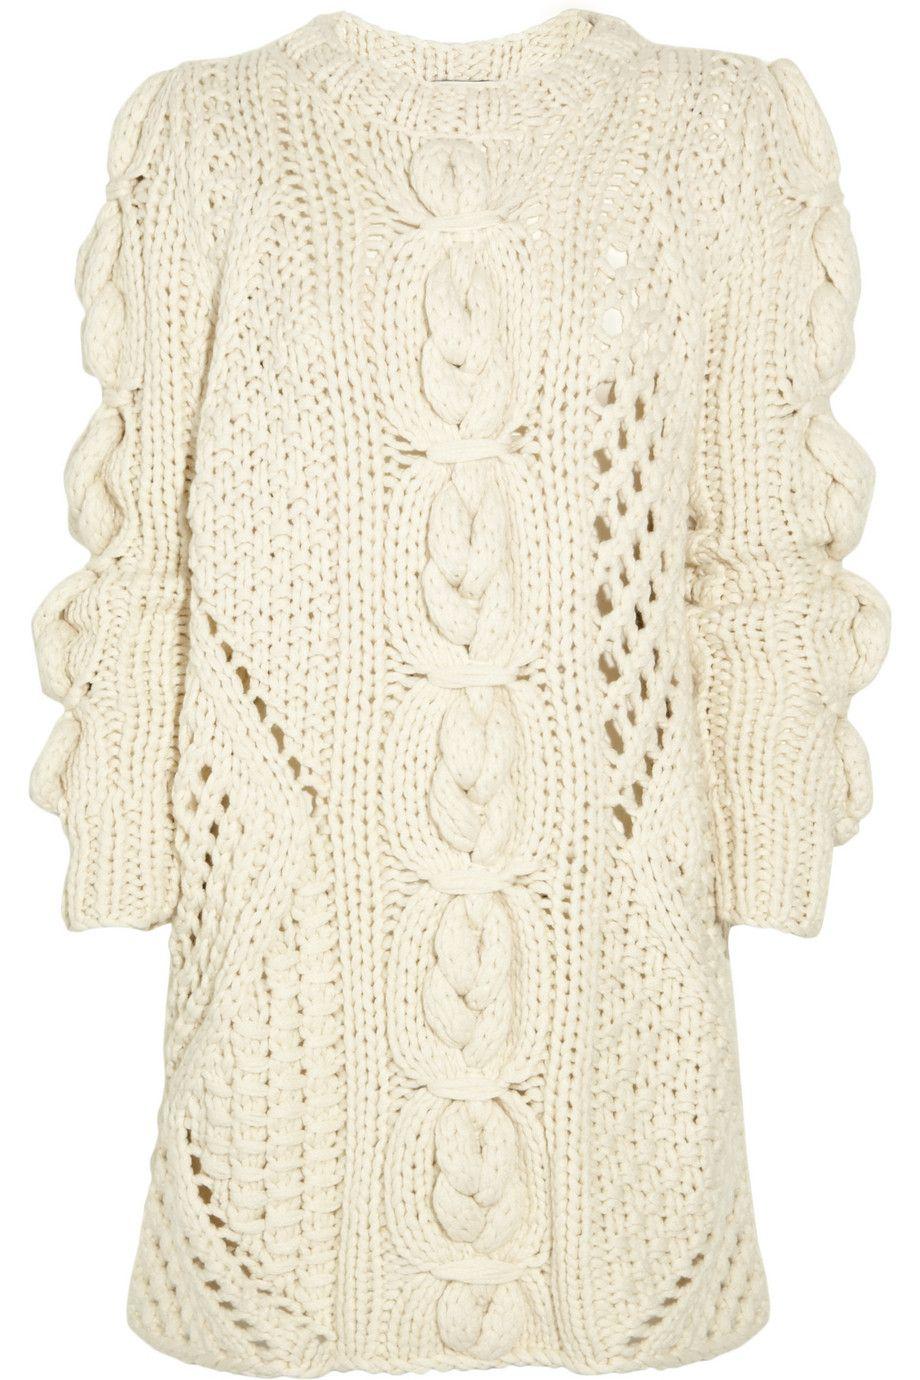 Pringle of Scotland Aran-knit cashmere sweater dress | tejidos ...